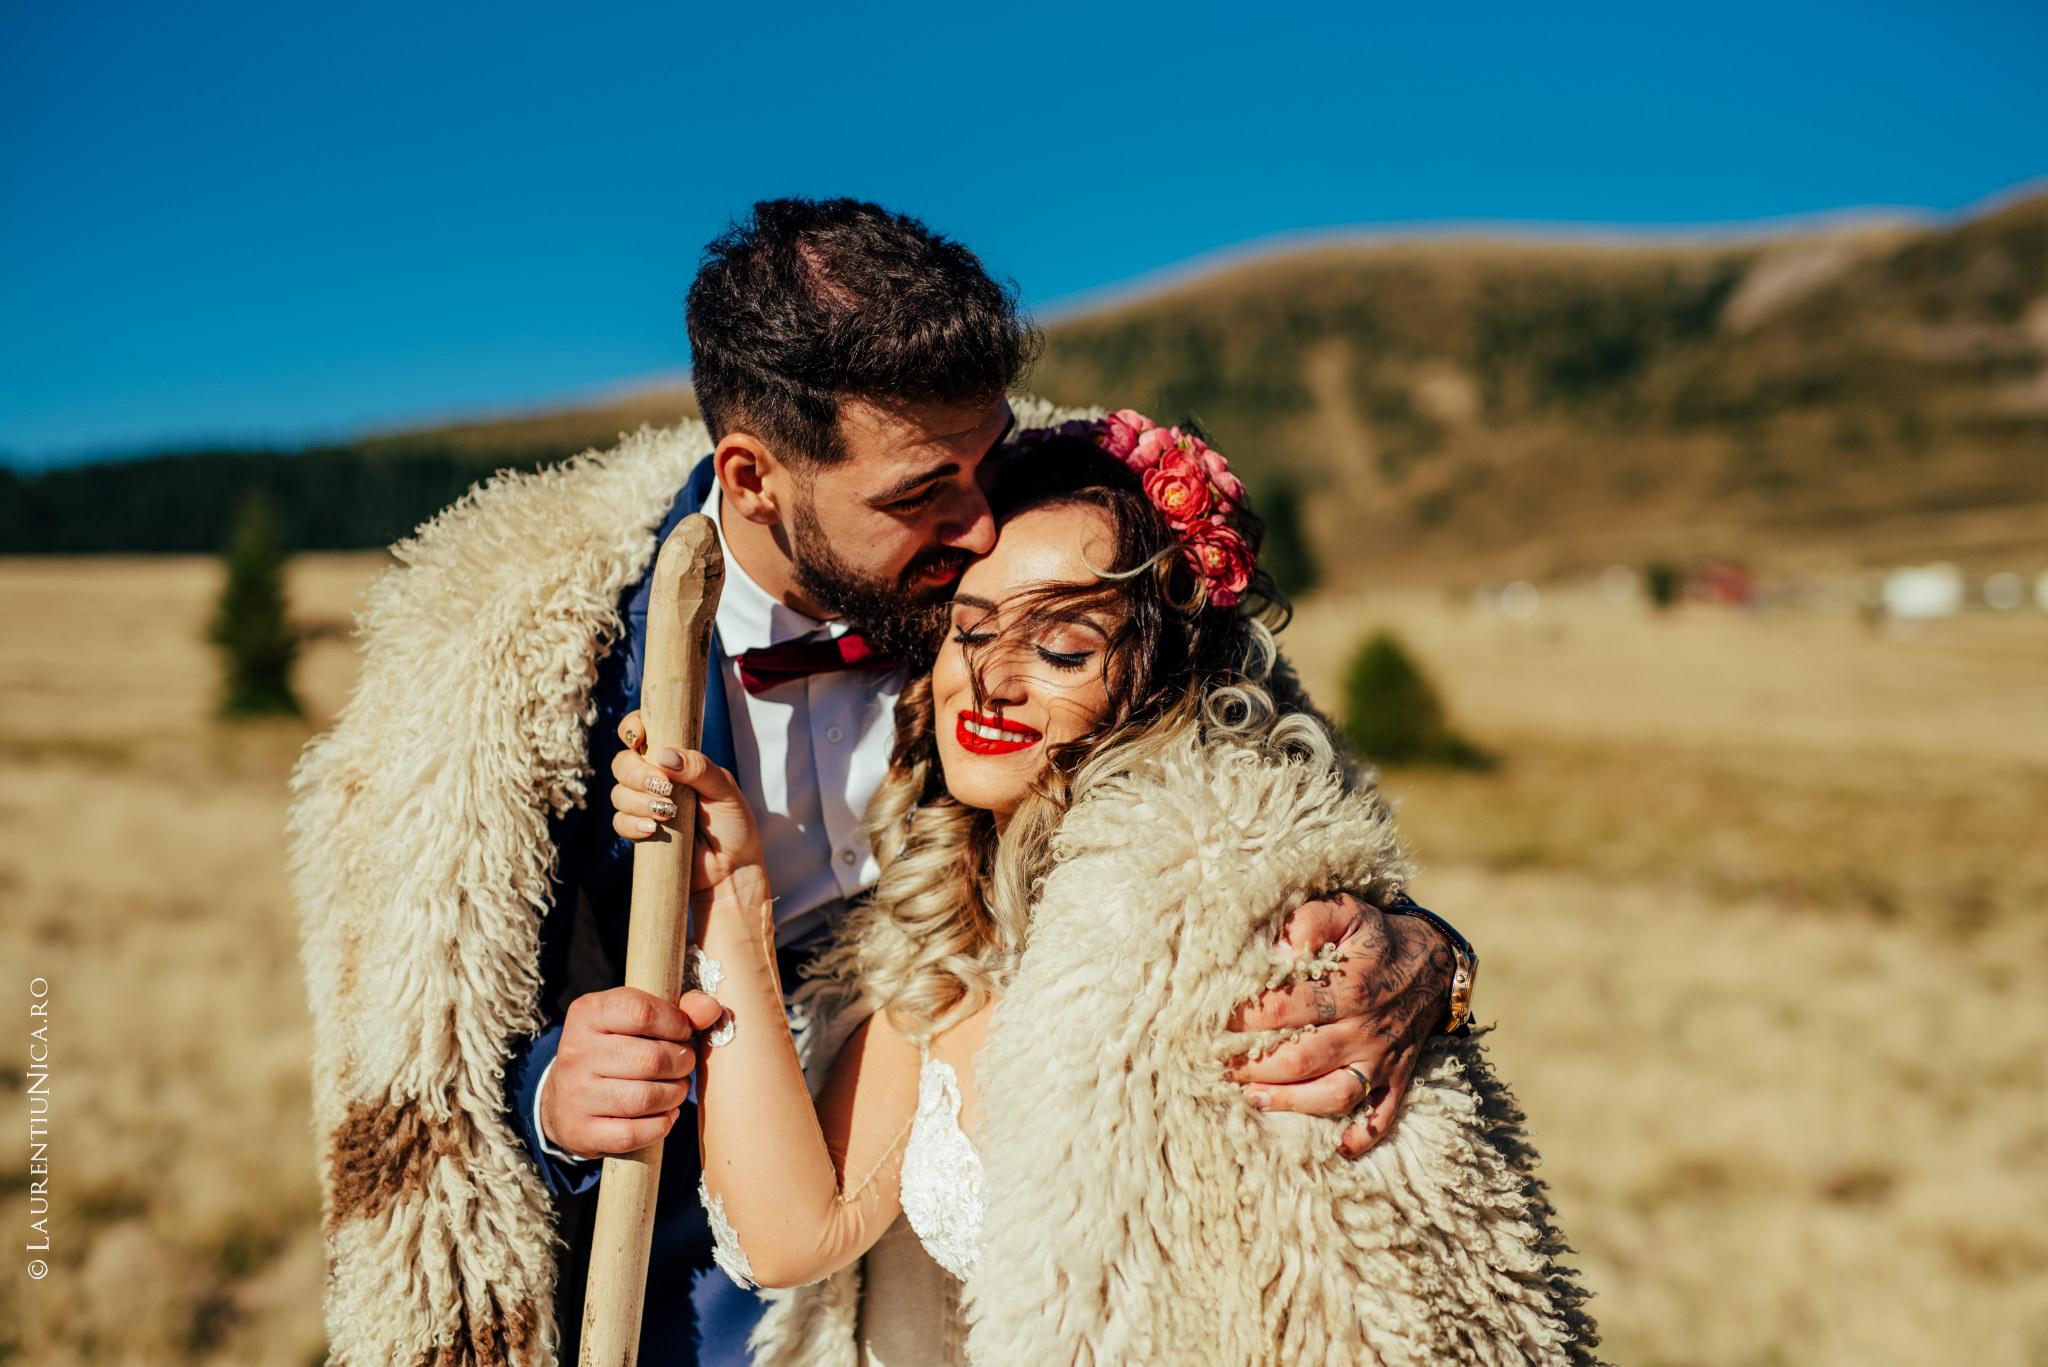 aida si alin fotograf nunta laurentiu nica transalpina 12 - Aida & Alin | Fotografii After Wedding | Transalpina - Muntii Parang